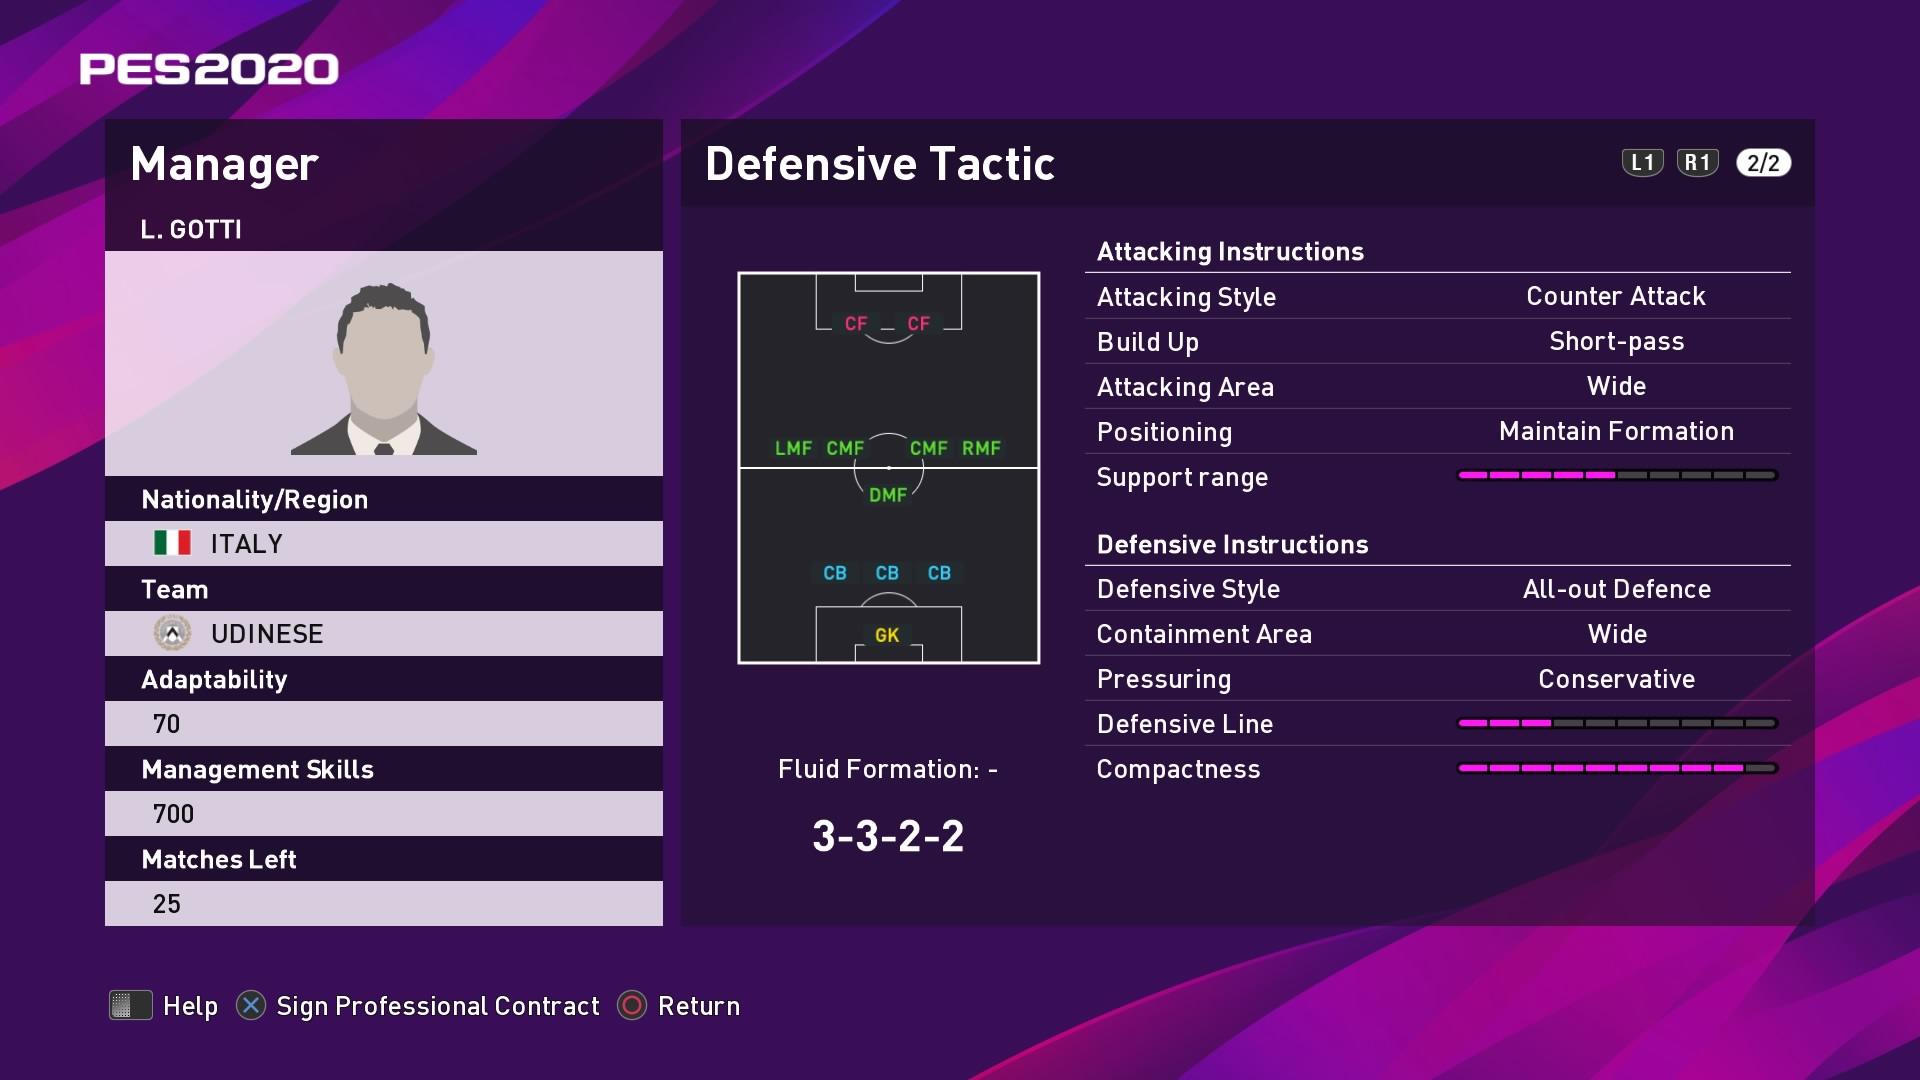 L. Gotti (Luca Gotti) Defensive Tactic in PES 2020 myClub